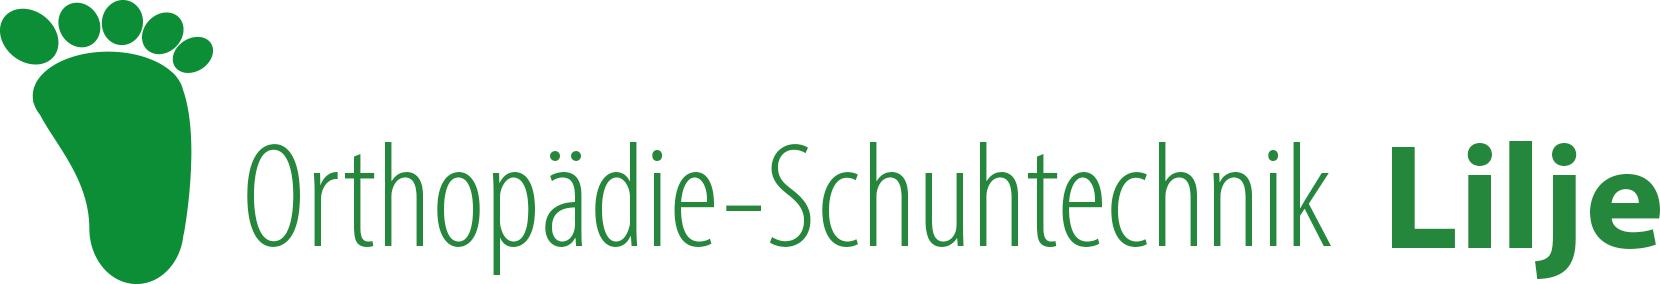 Orthopädie-Schuhtechnik Lilje in Wolfsburg Logo